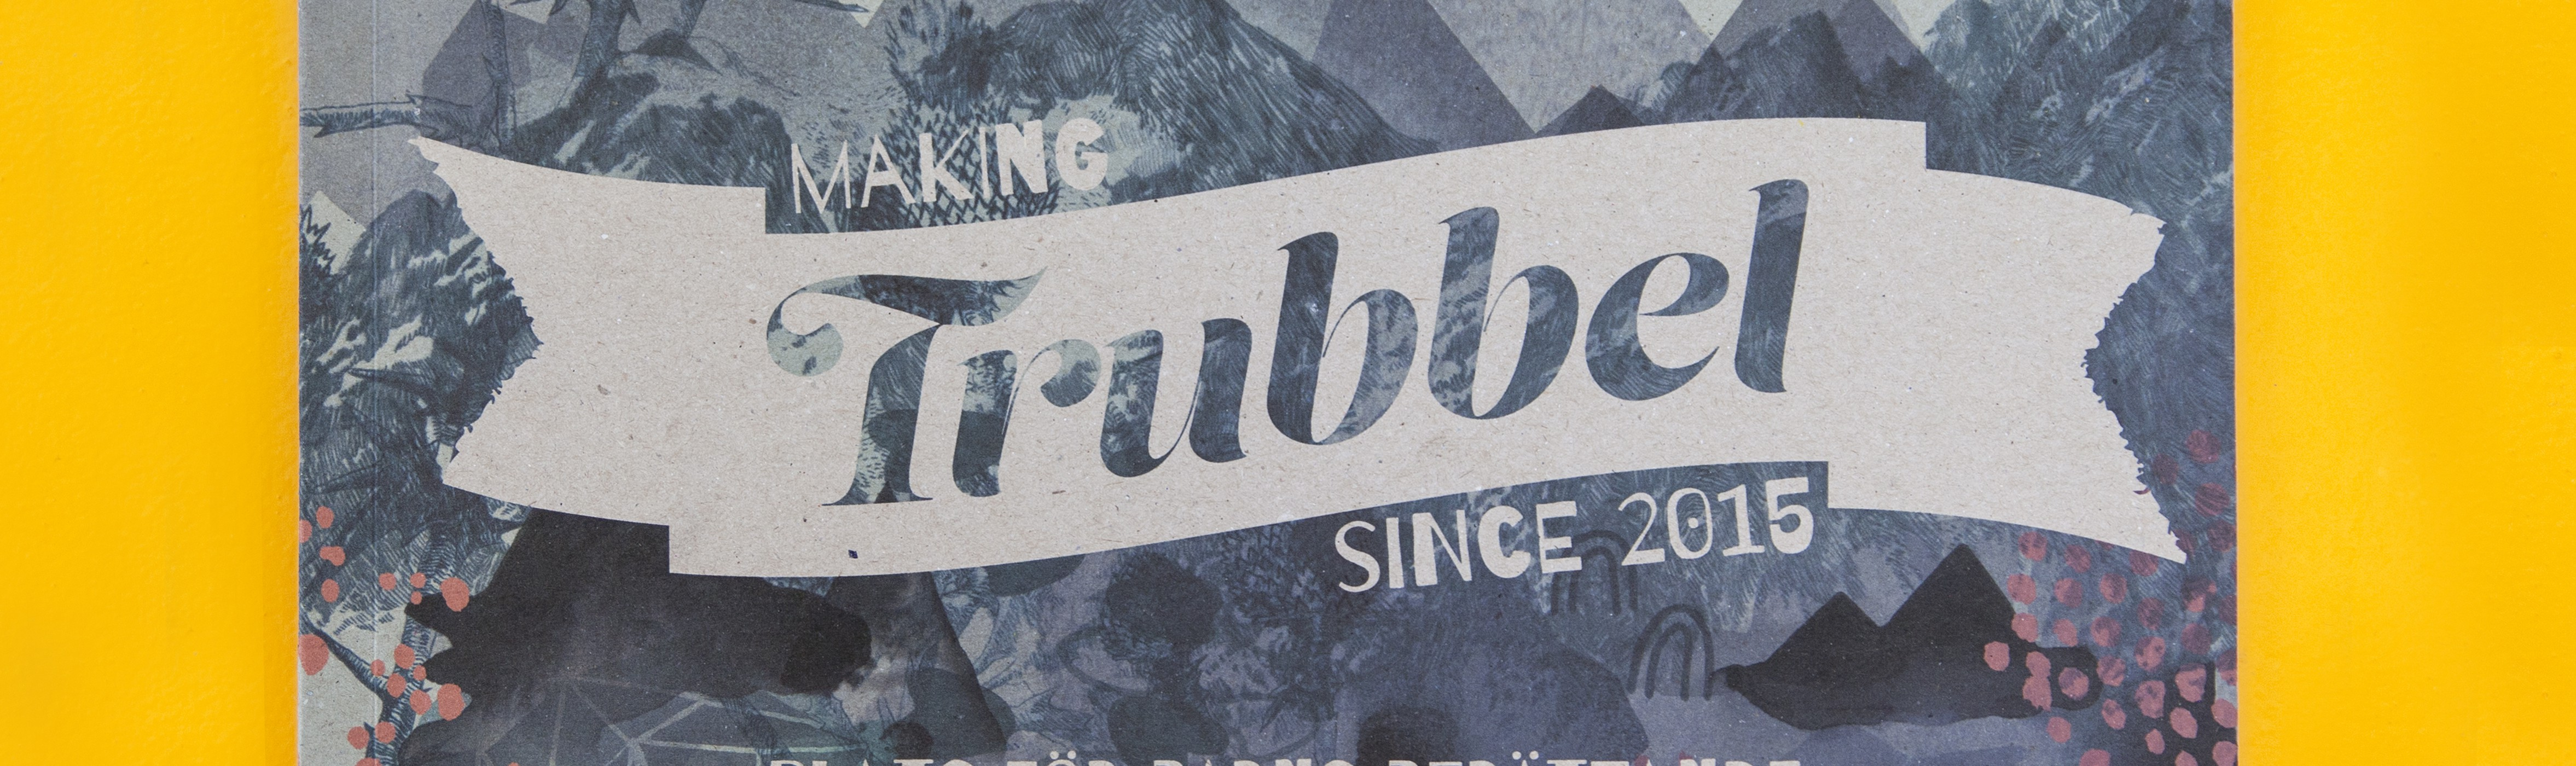 Trubbel-7